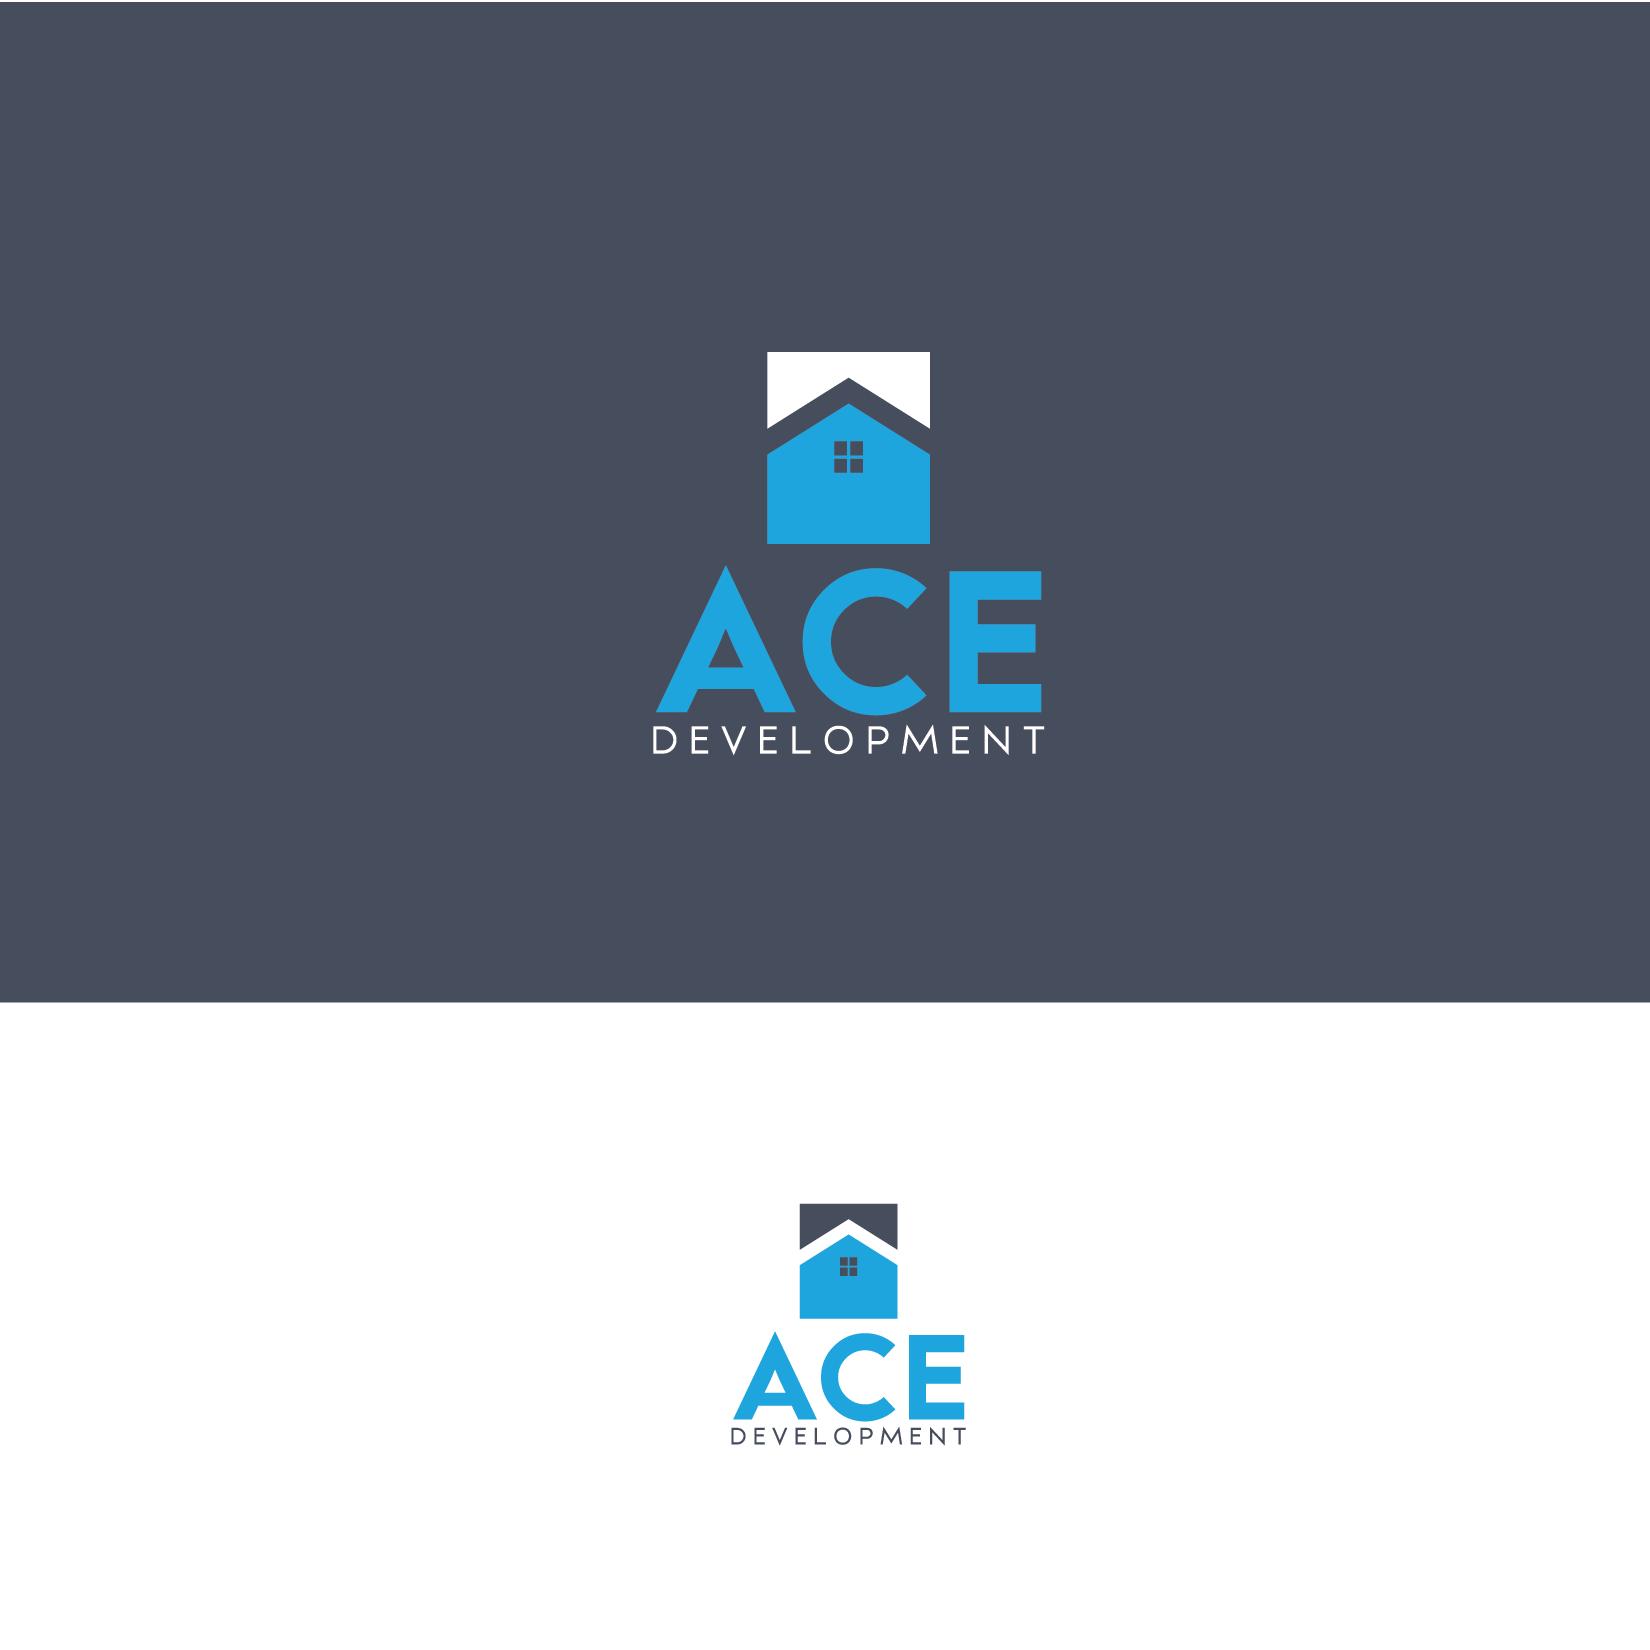 Logo Design by Private User - Entry No. 99 in the Logo Design Contest Fun Logo Design for Ace development.